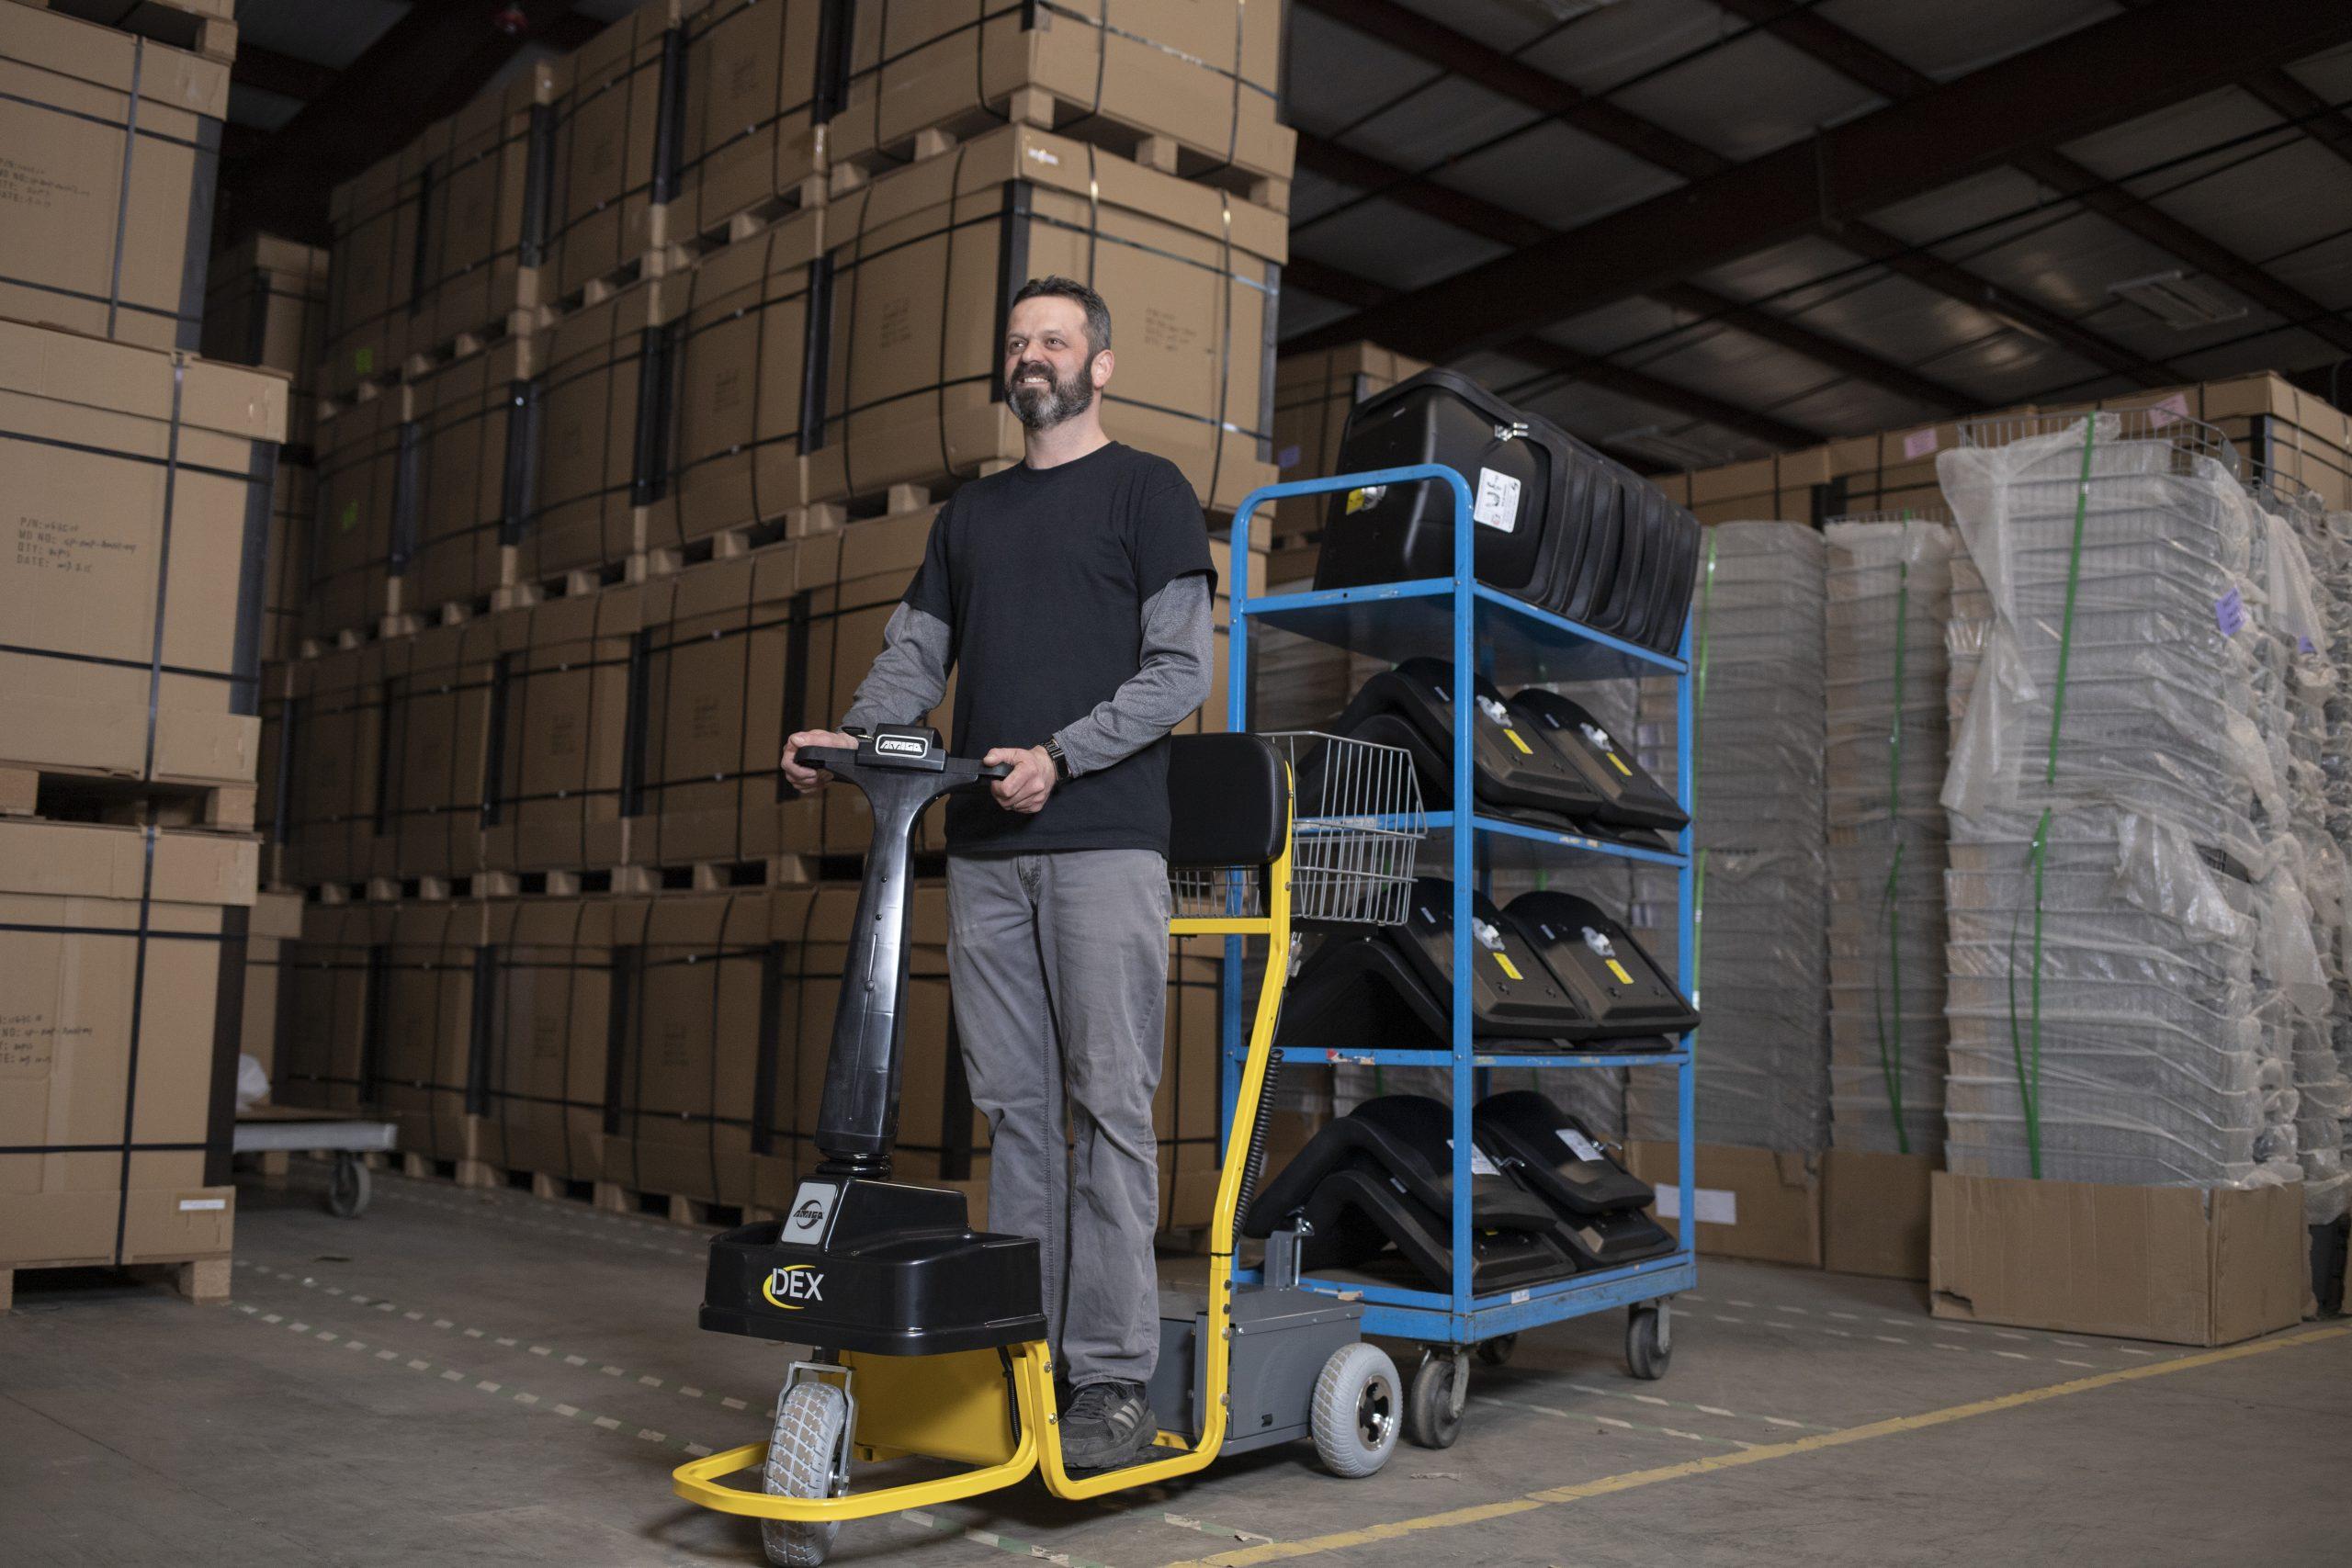 Dex by Amigo electric tugger tows 1,500 lbs